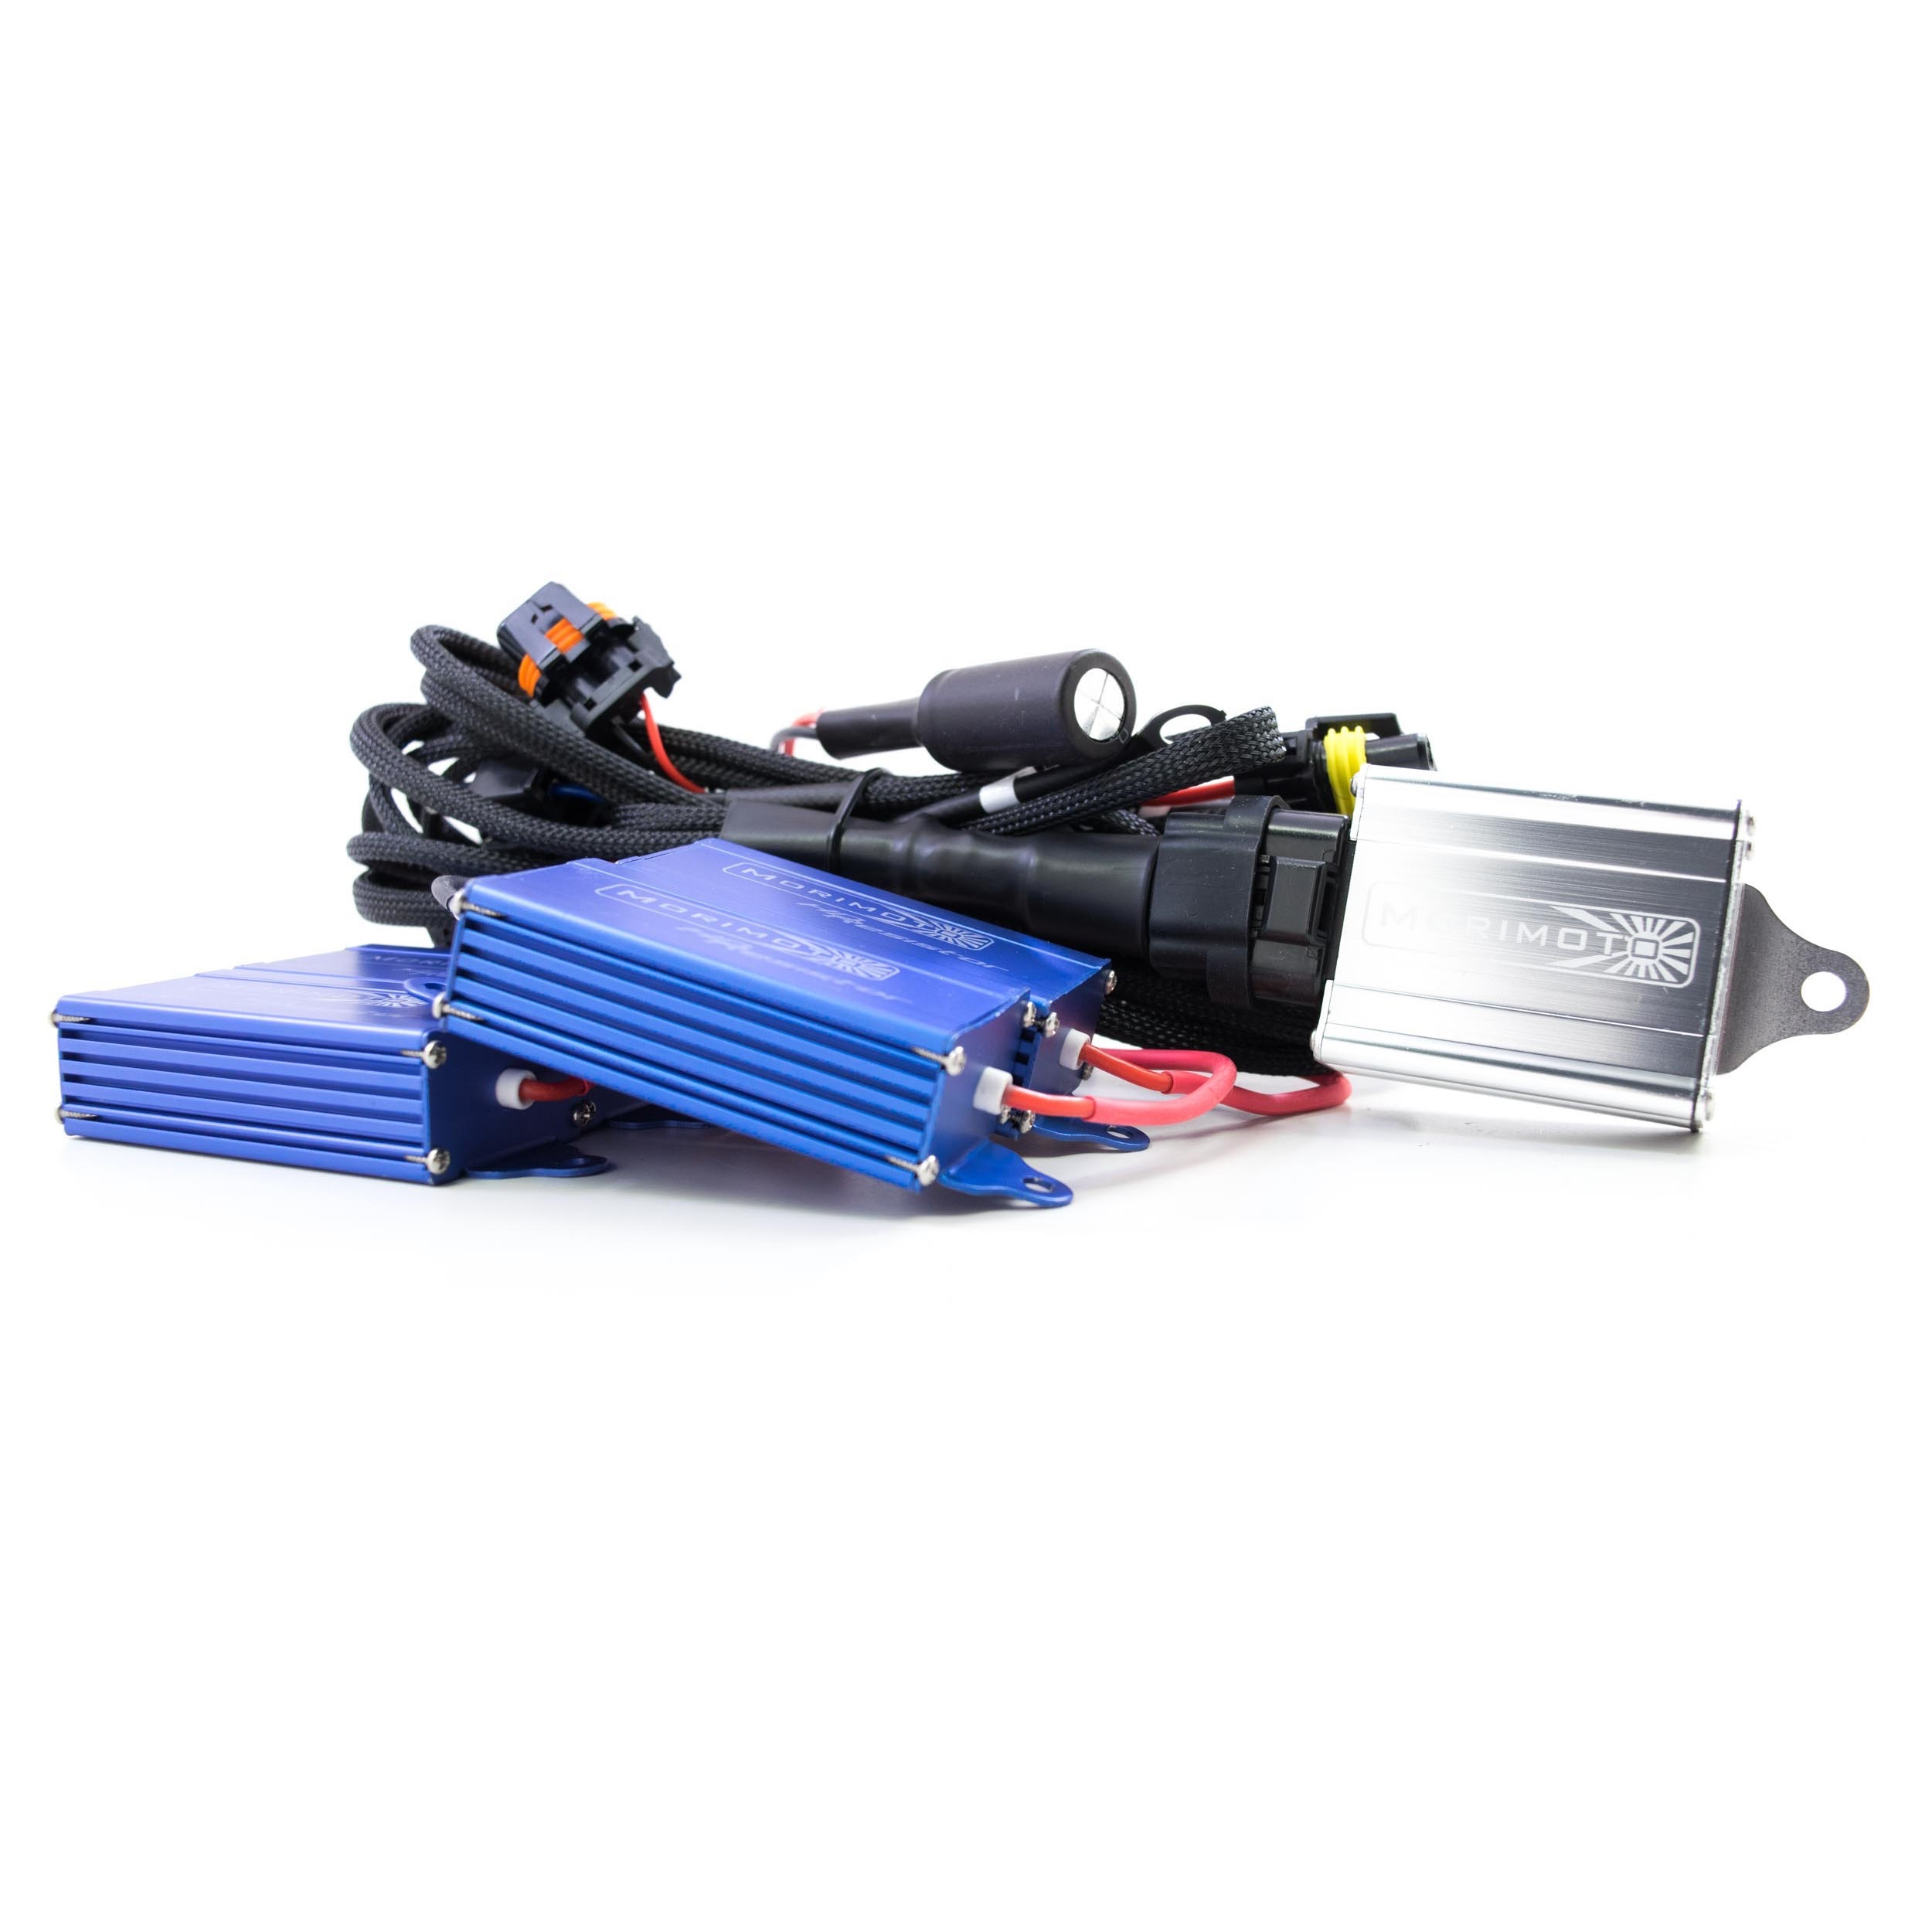 Morimoto Mopar Spec 9004 9007 Bi Xenon Harness Hid Kit Pros Dodge Demon Wiring